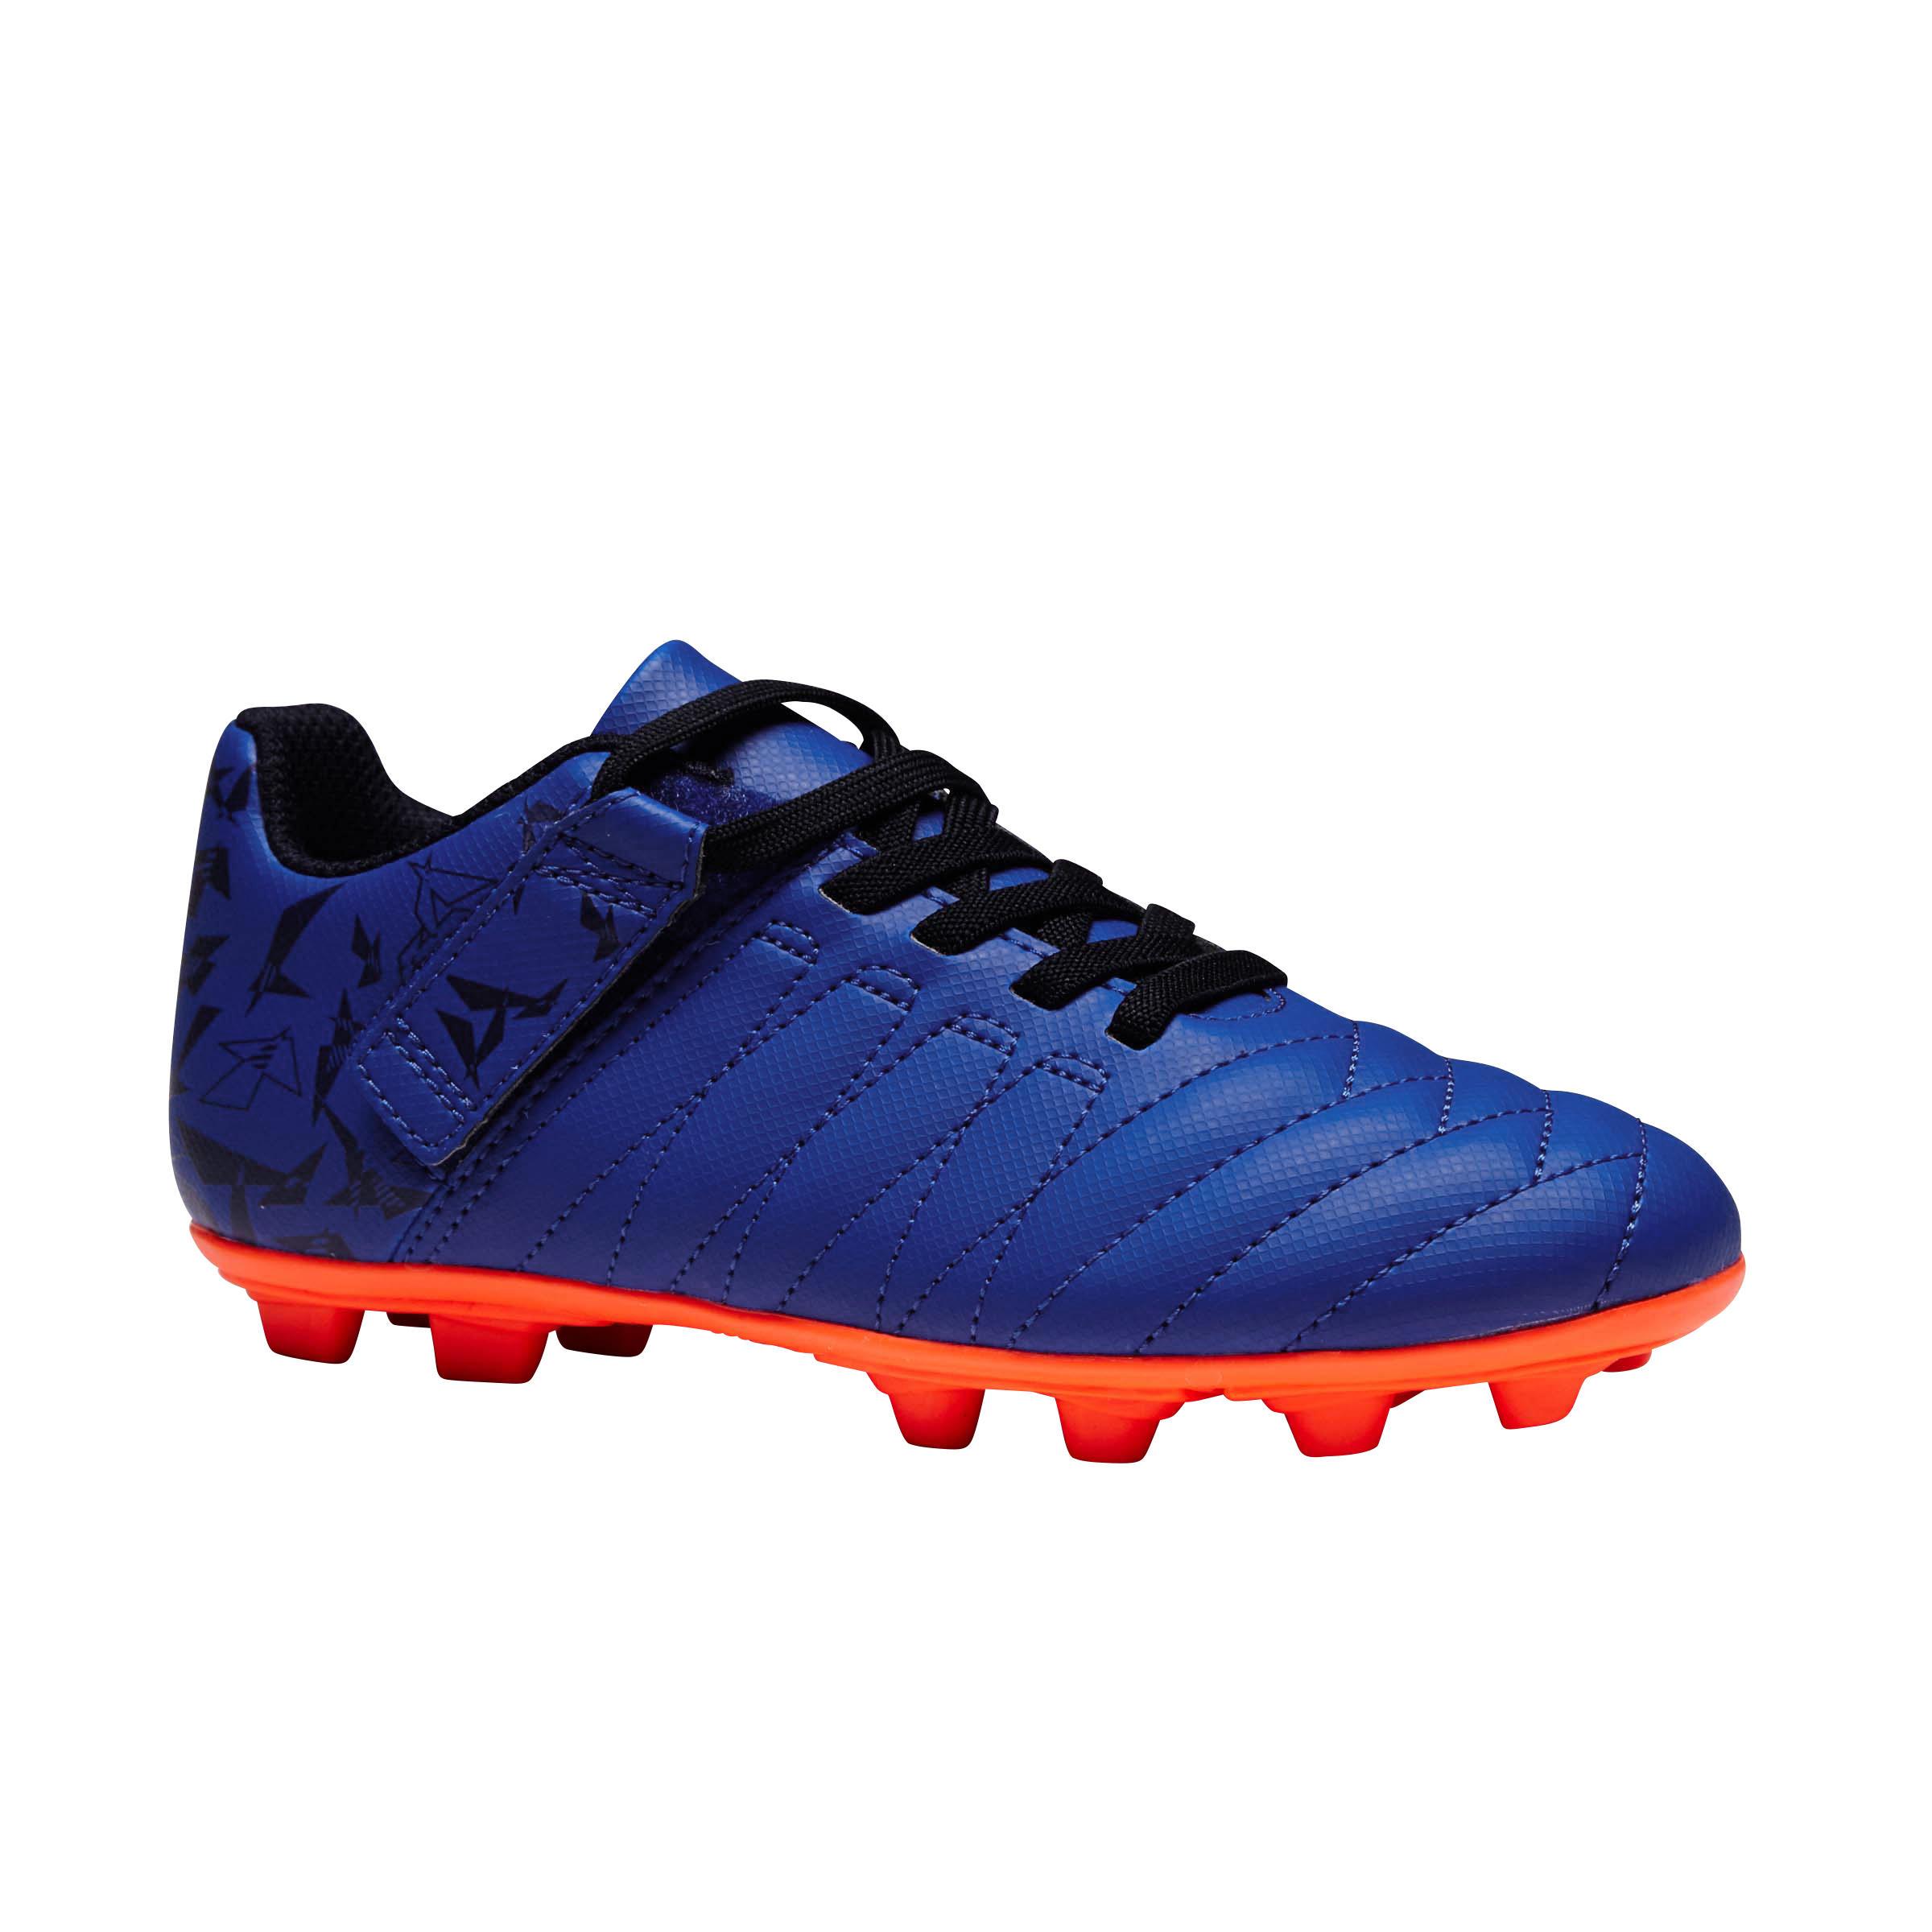 best sneakers lowest discount good texture Chaussures de Football pas cher: Kipsta, Nike, Adidas, Puma ...